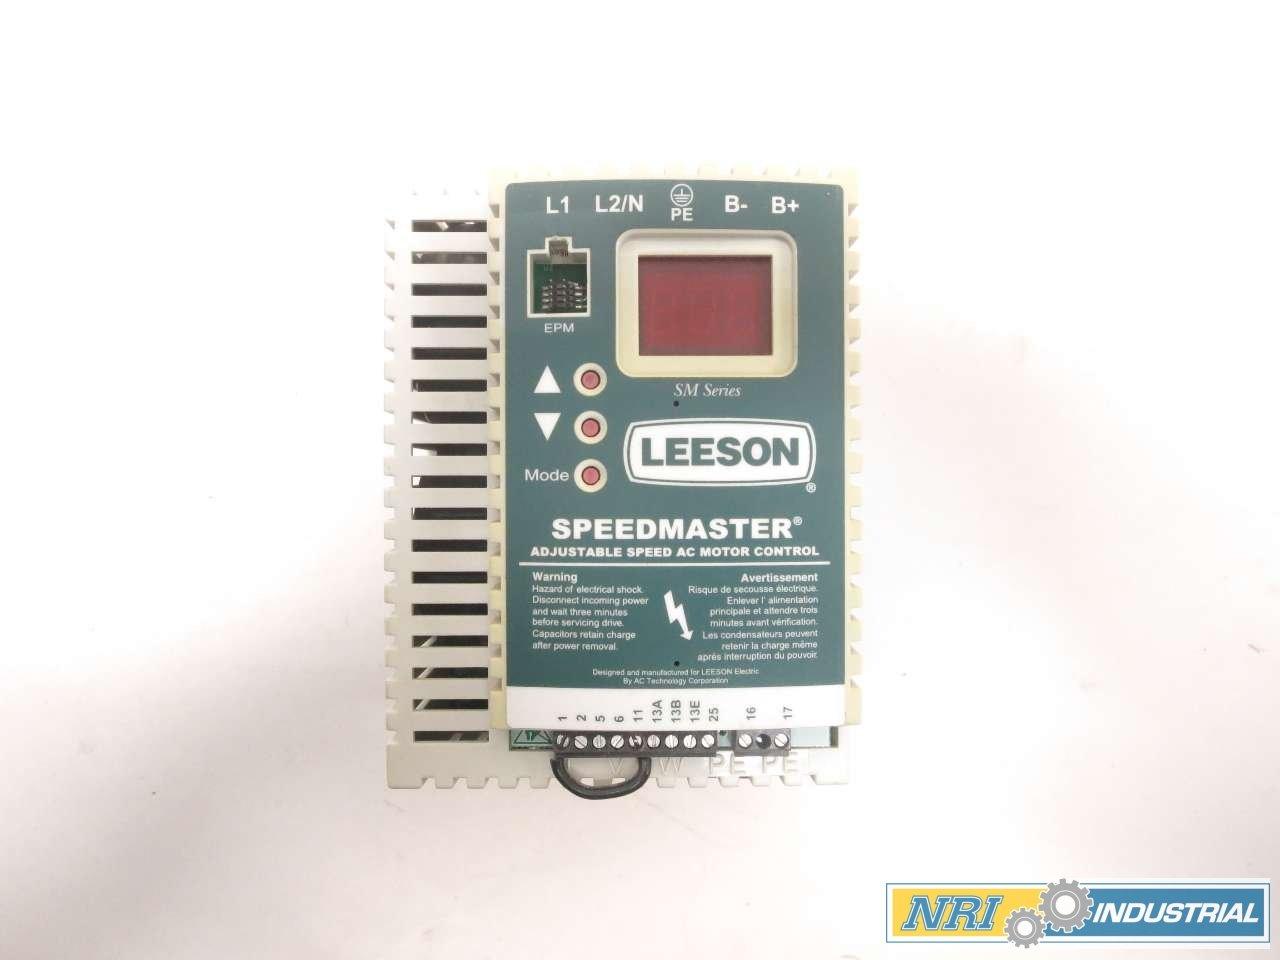 LEESON 174266.00 SPEEDMASTER SM SERIES 1.5HP 0-230V 6A CONTROL DRIVE D518447